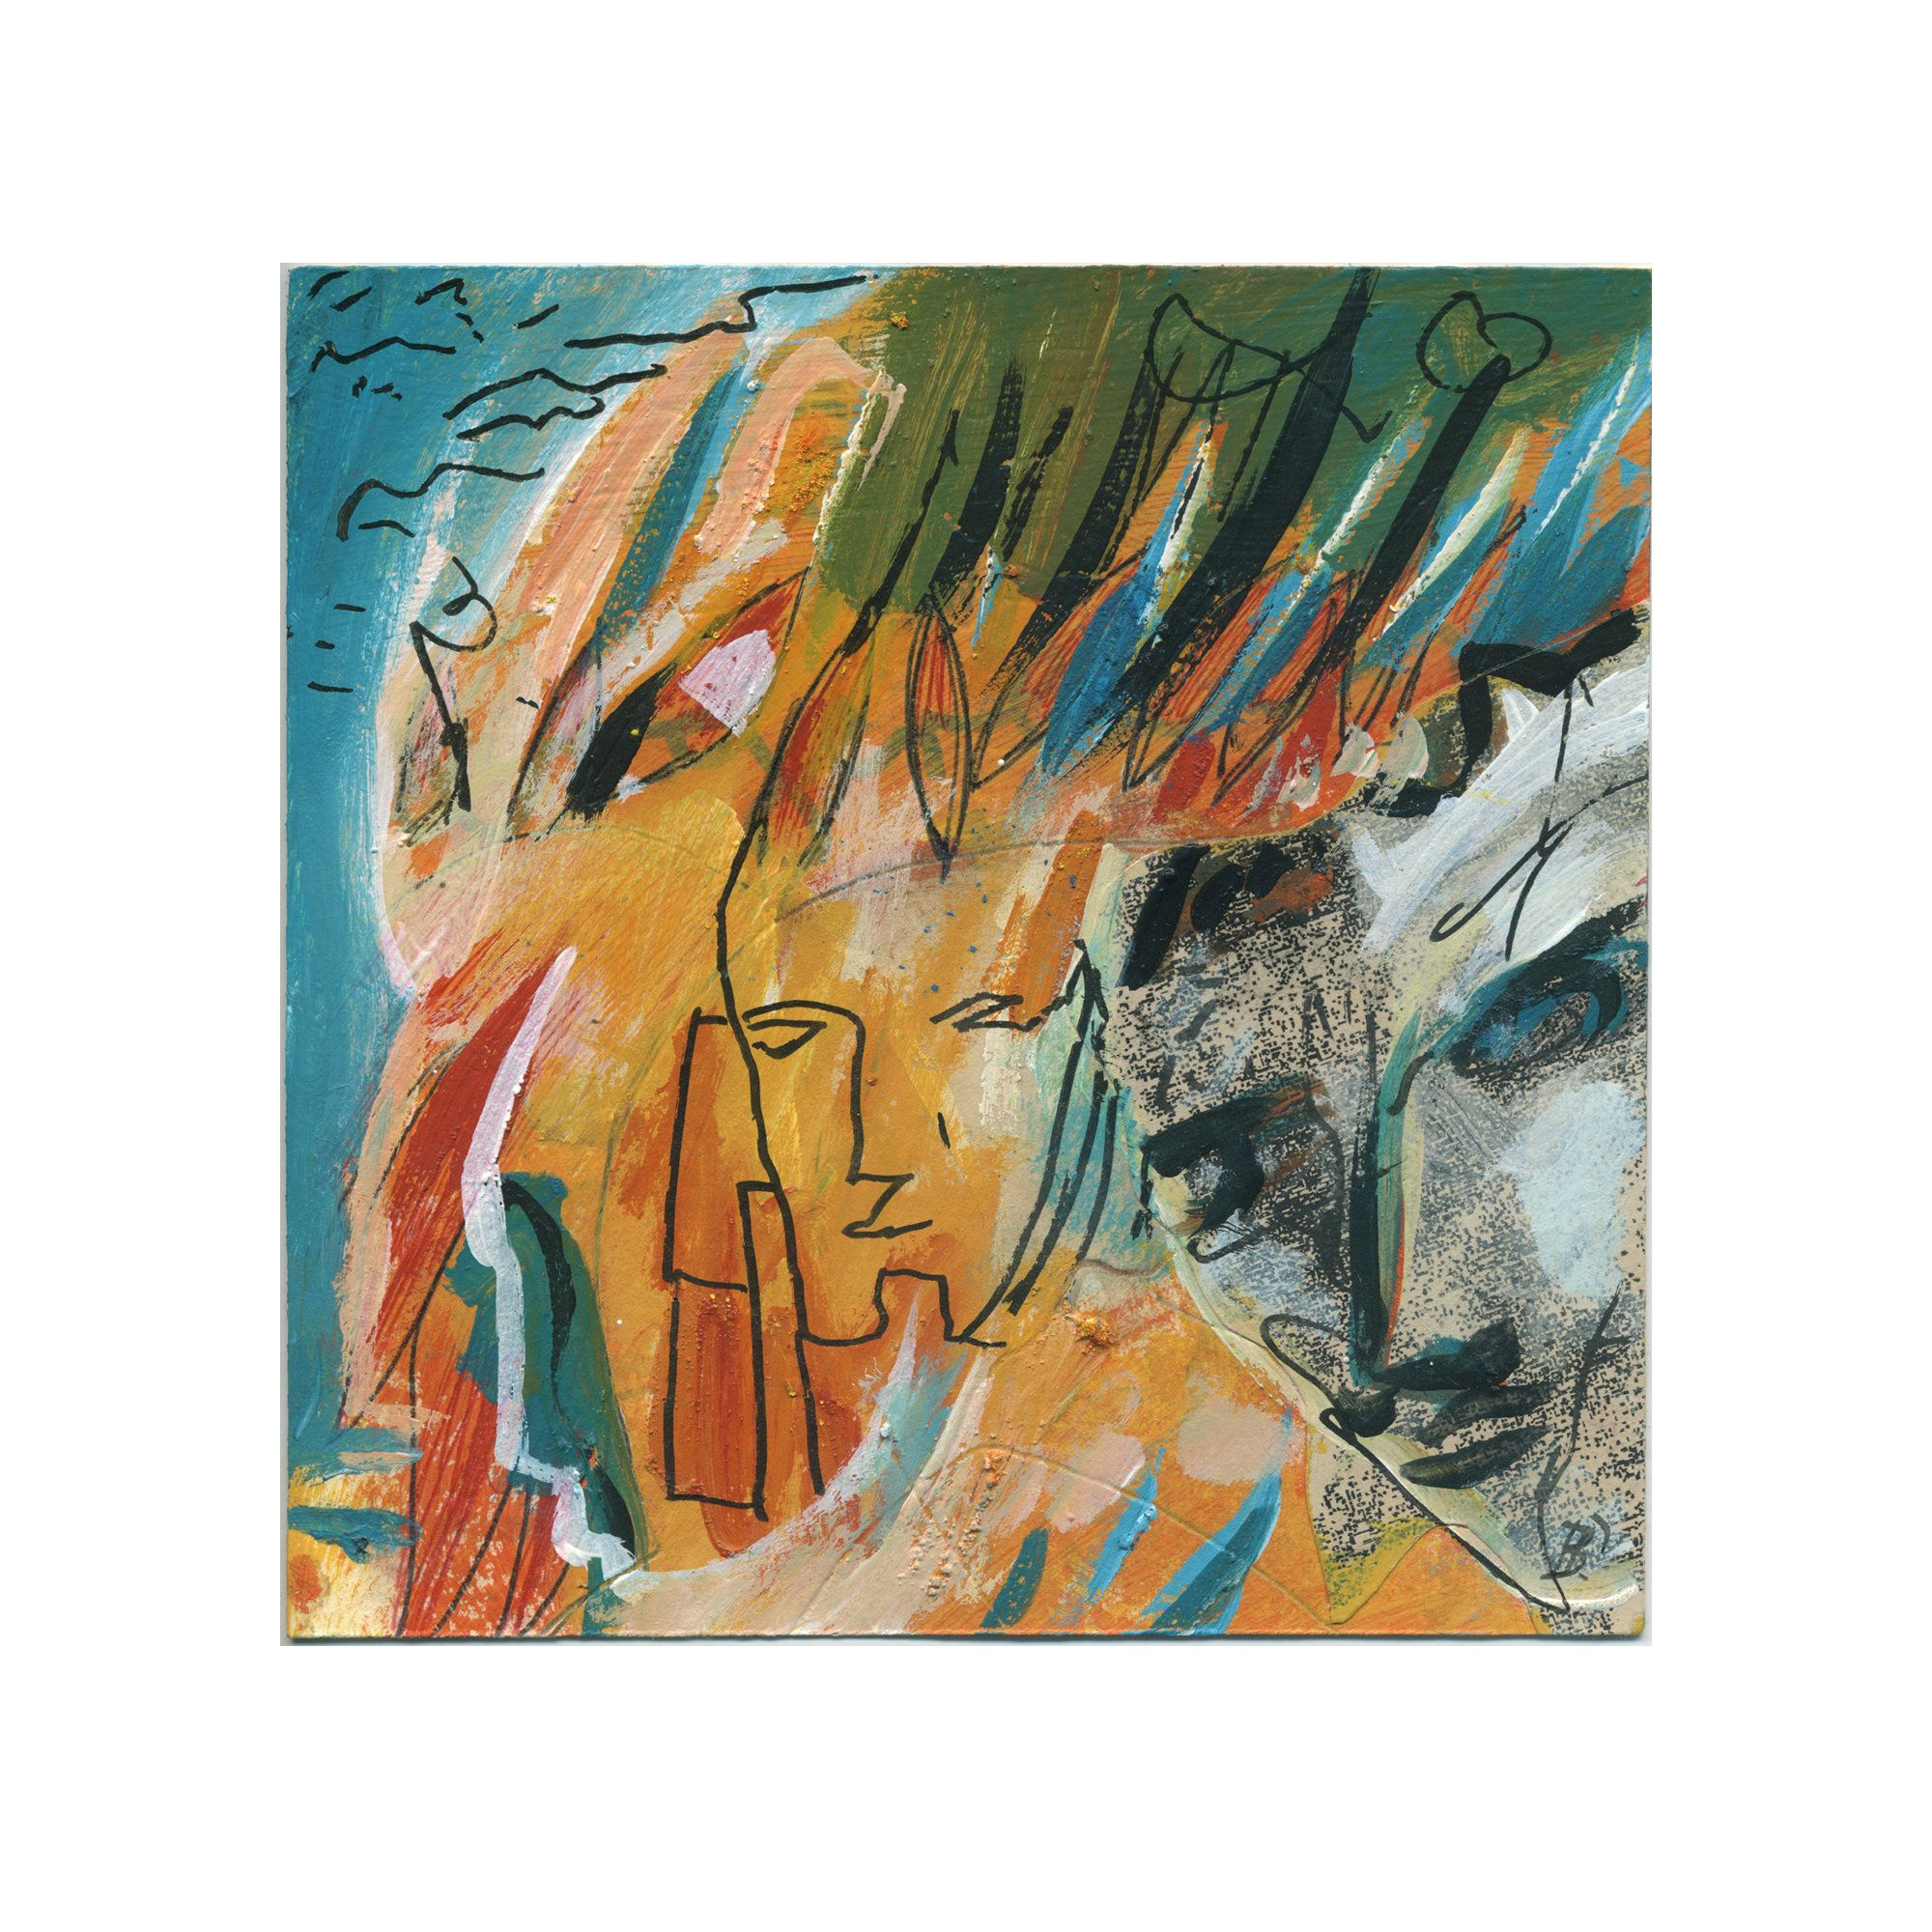 Bild Unikat 15 15 Cm 5 9 5 9 Inch Abstrakte Malerei Abstrakte Kunst Farbenfrohe Wandbilder Abstract Painting Original Paintings Figure Painting